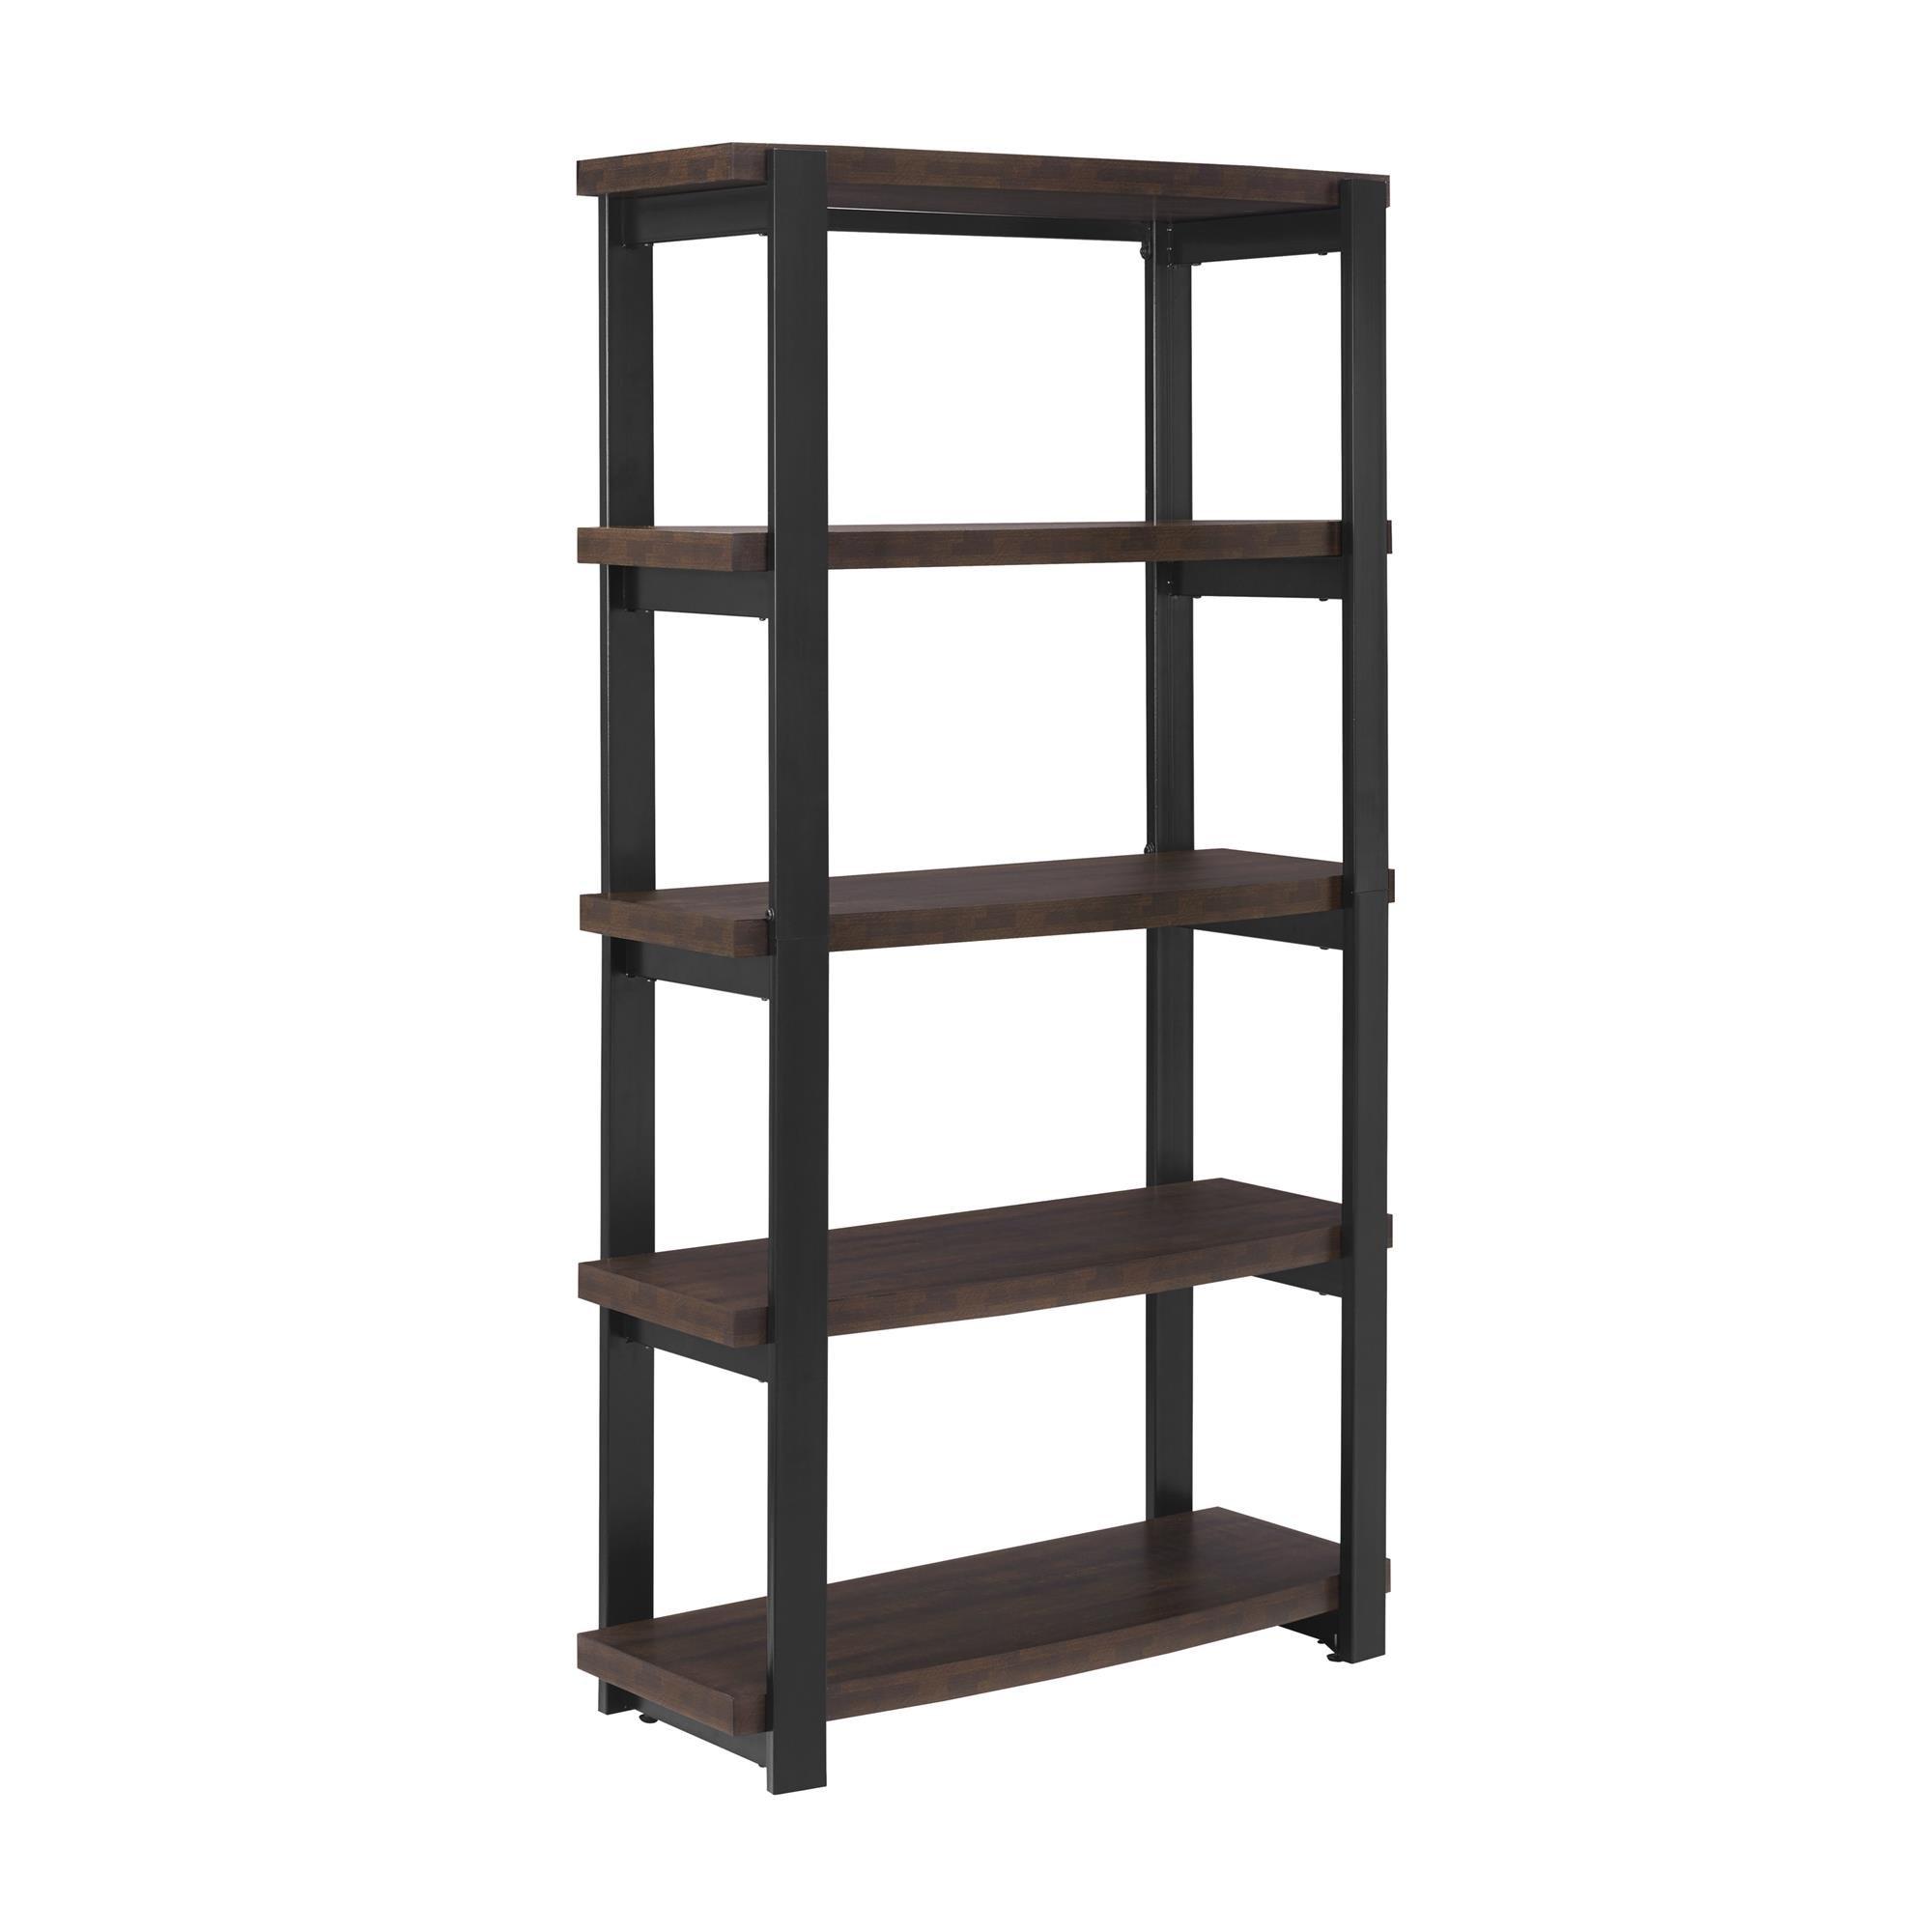 Ameriwood Home 9664096COM Castling Wood Bookcase, Espresso